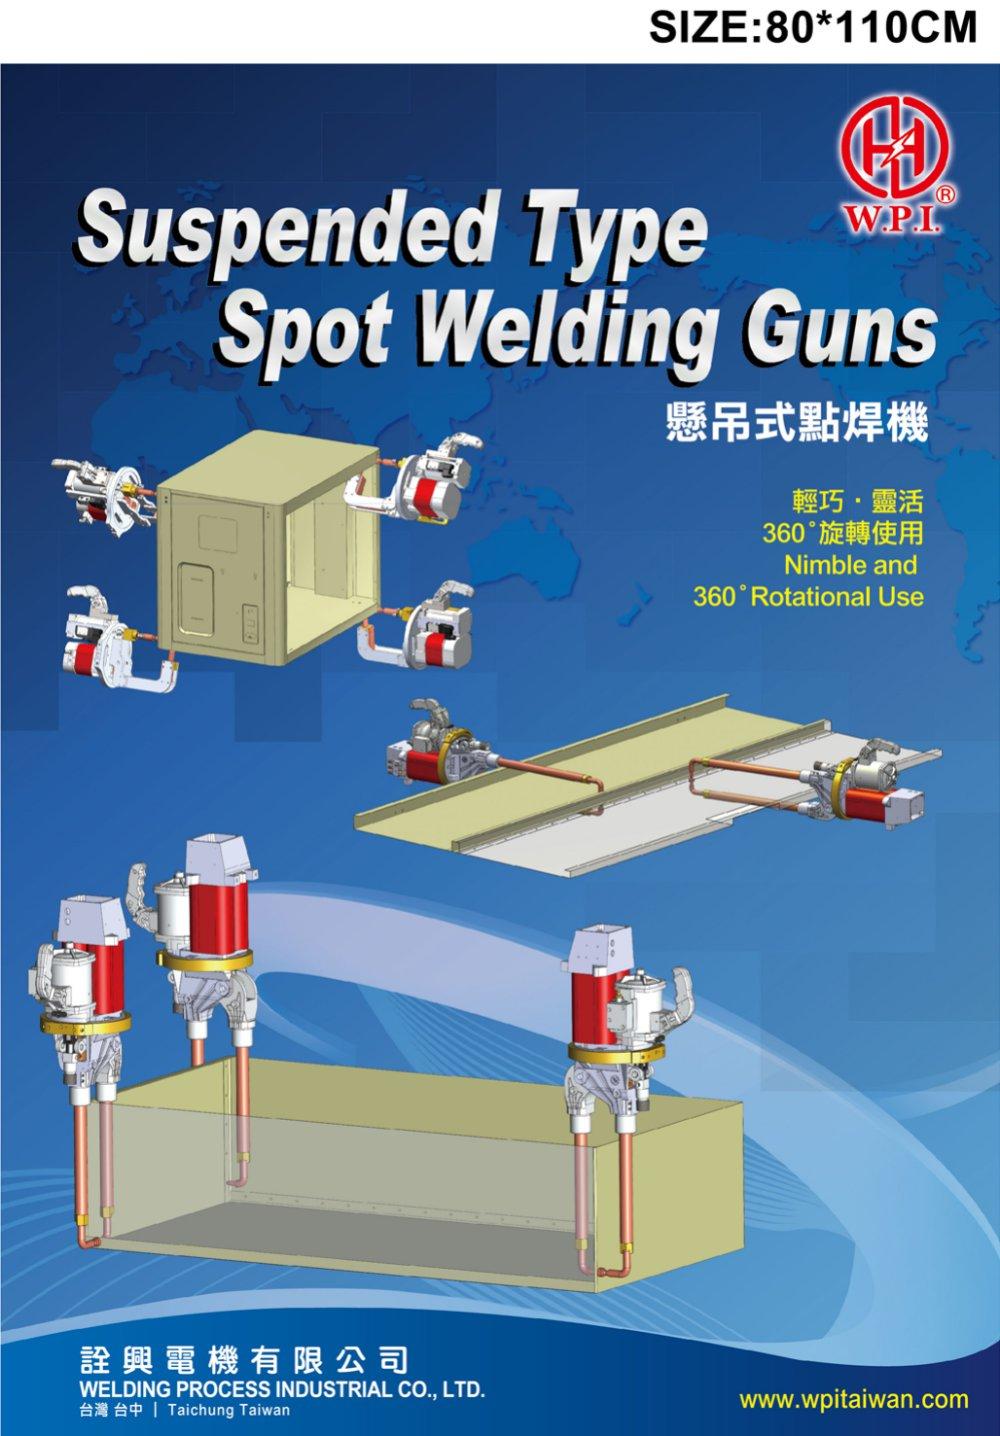 3d Imitation Wpi Taiwan Welding Process Industrial Co Ltd Spot Machine Diagram 1 Pages